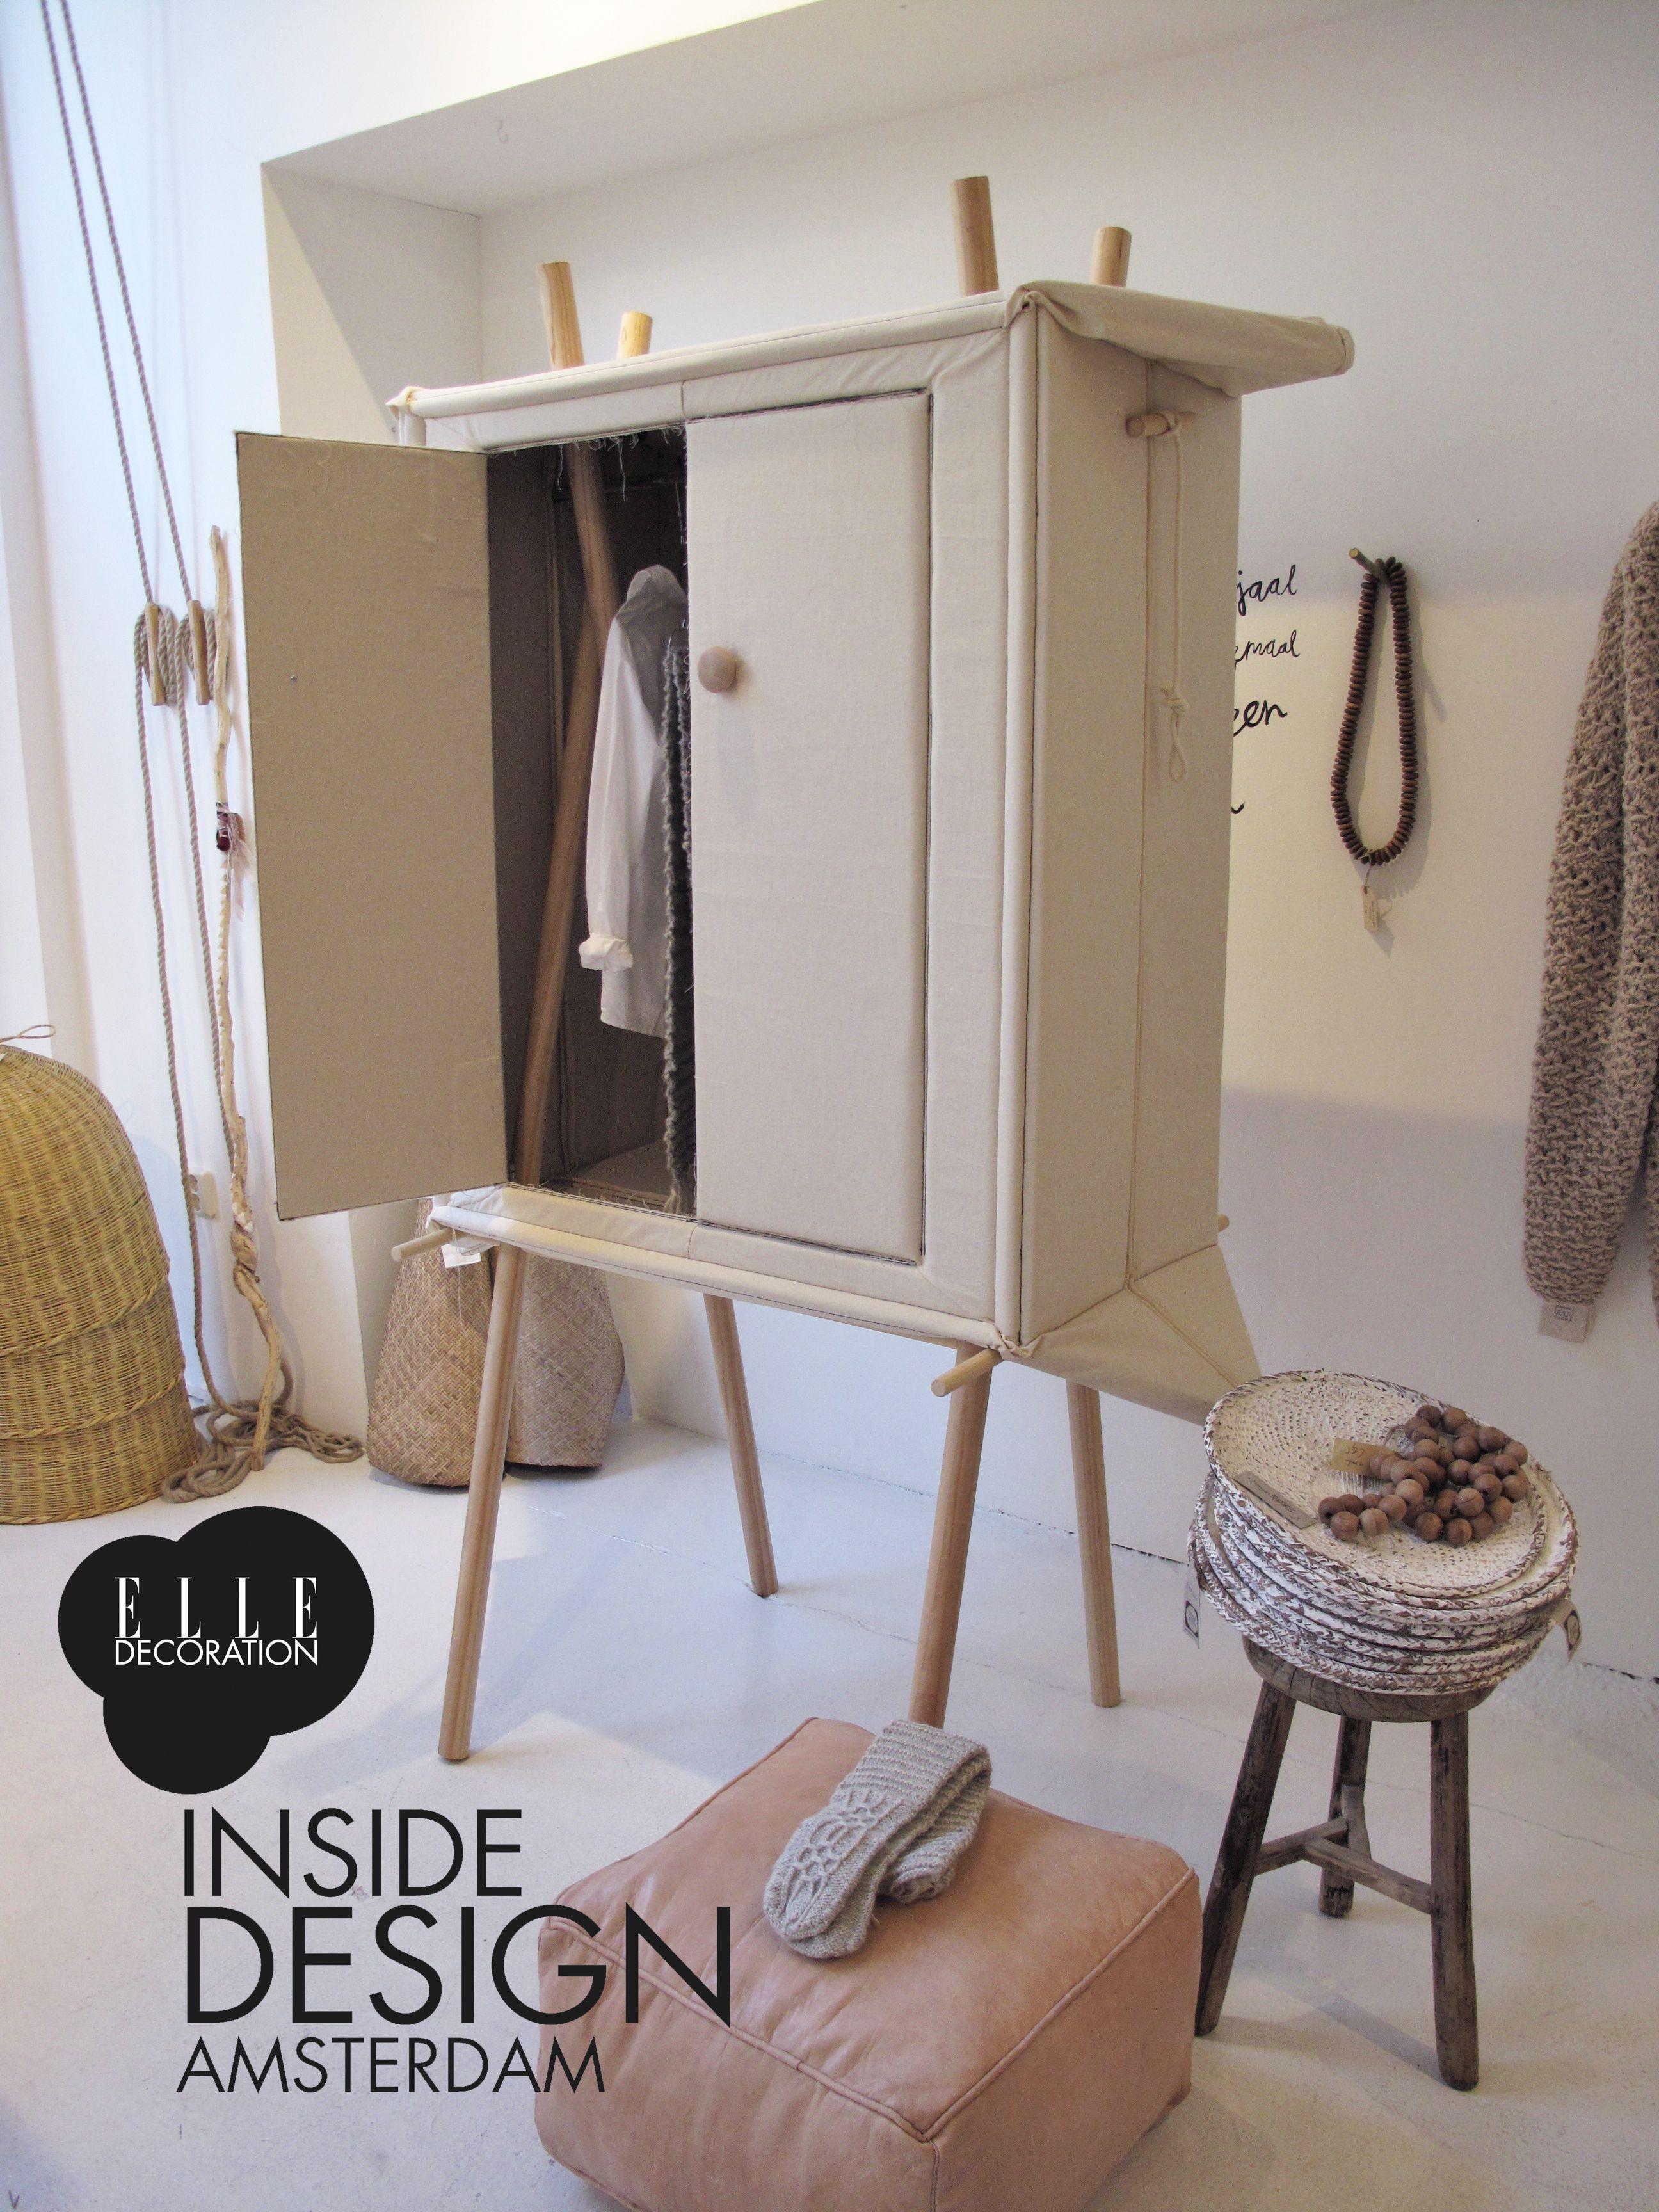 pop-up linen cabinet at sukha amsterdam during inside design